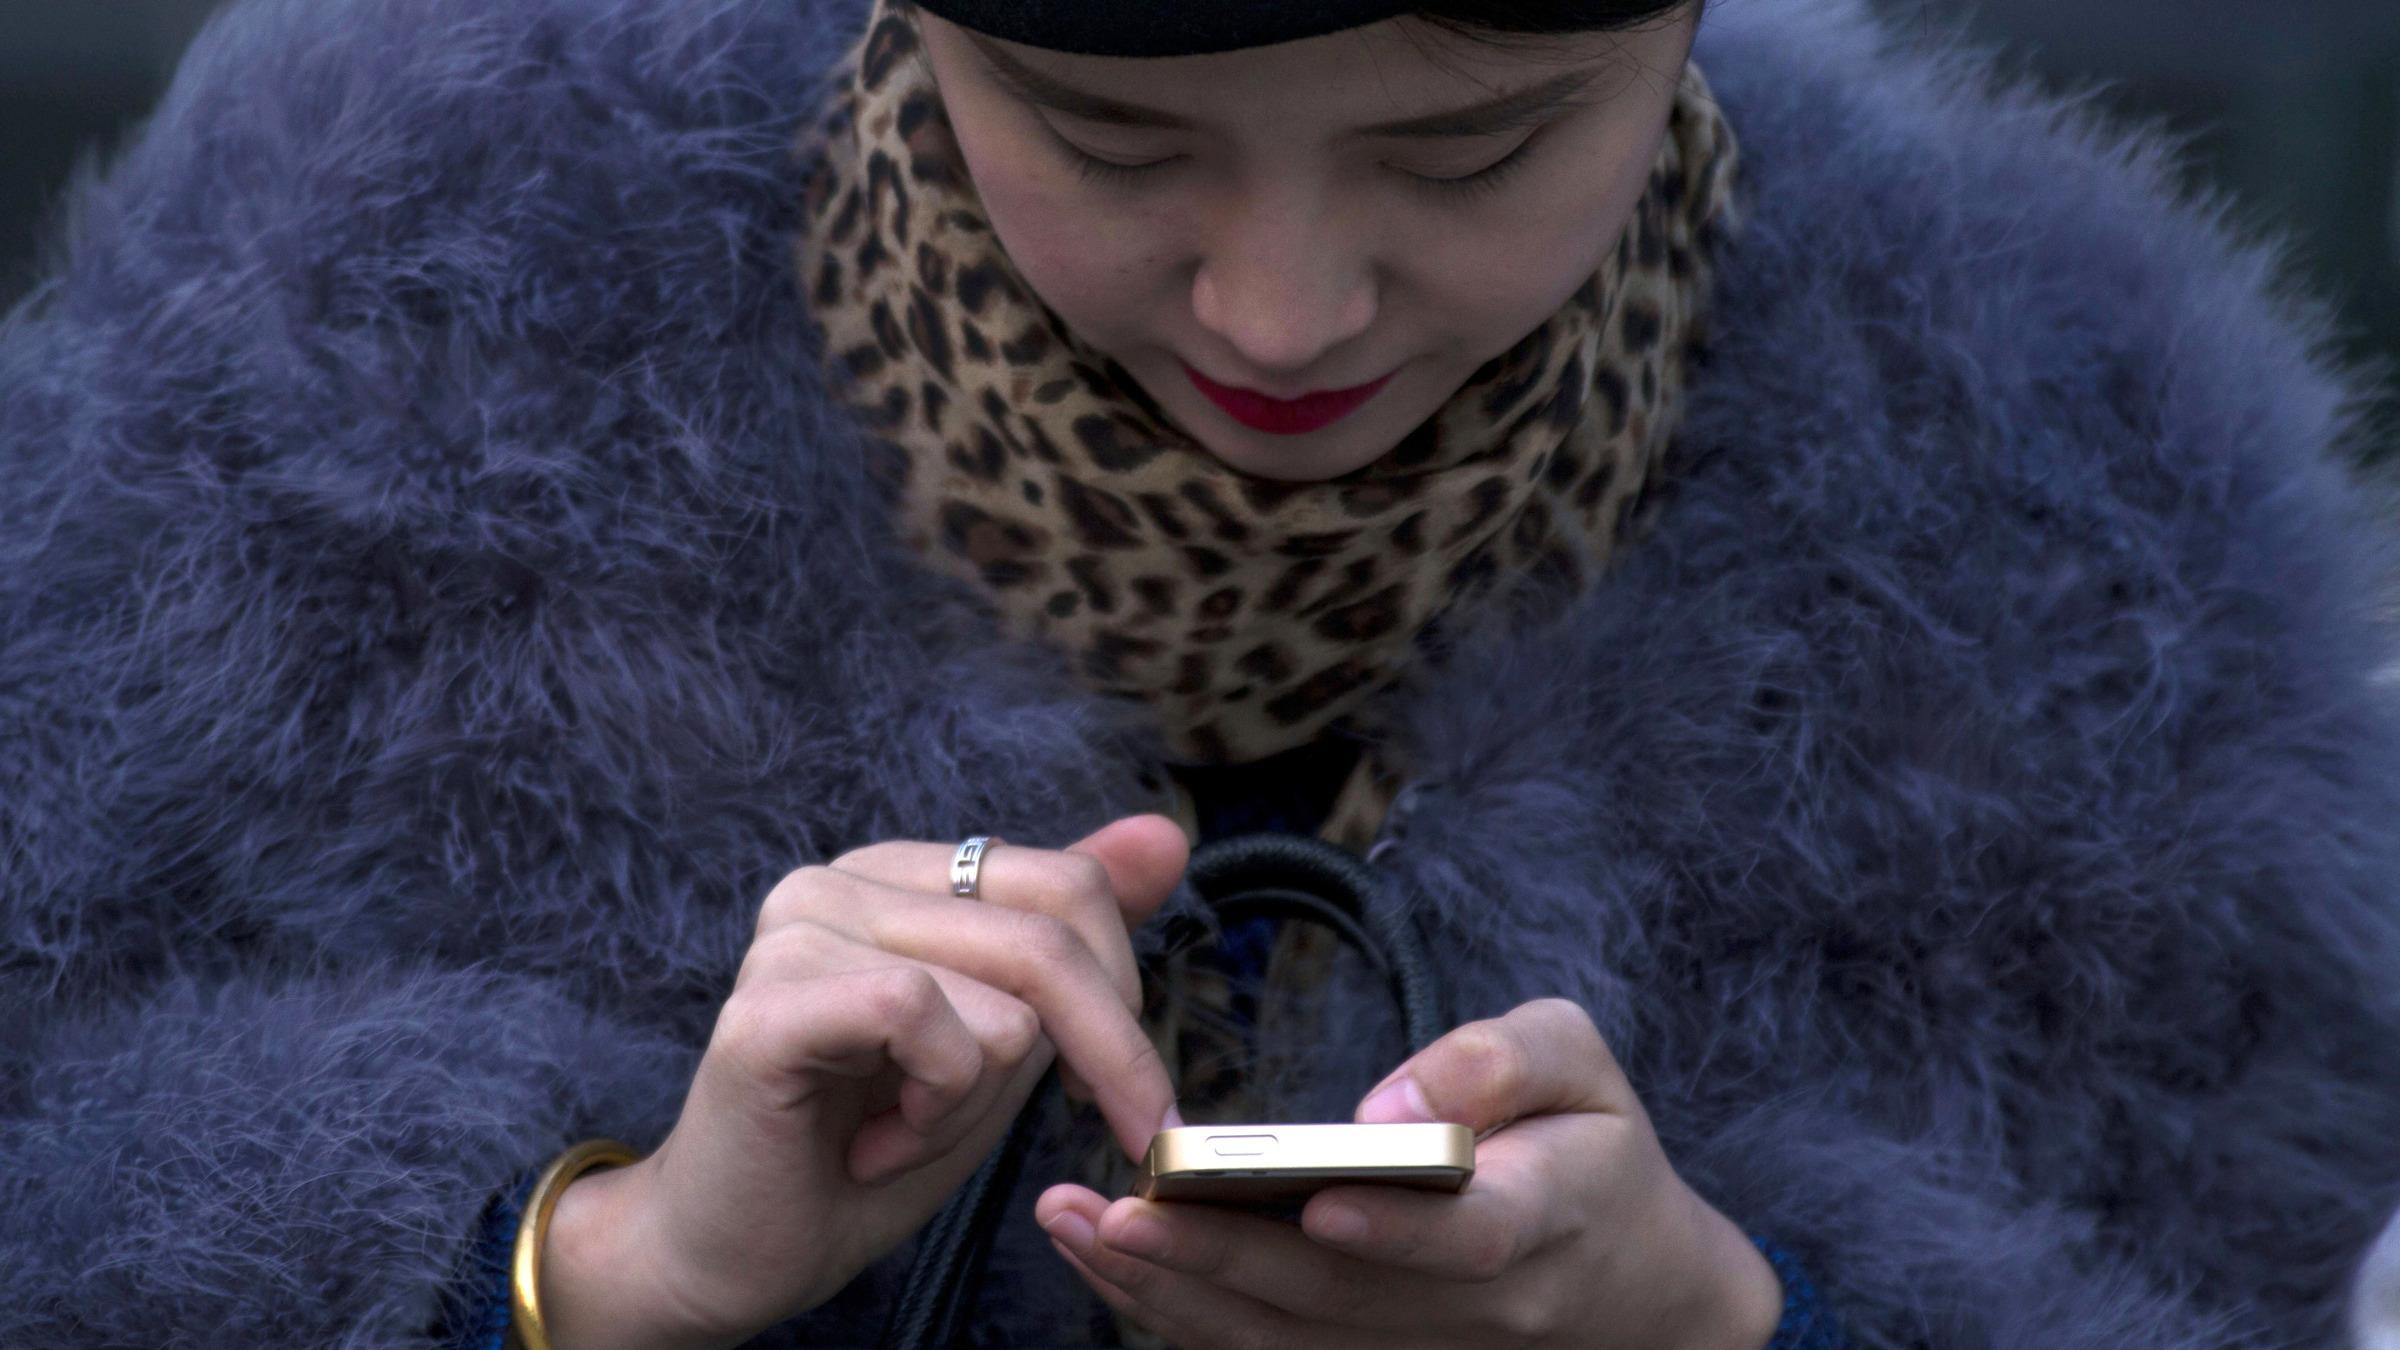 A Chinese woman uses a smartphone in Beijing, China, Sunday, Dec. 1, 2013. (AP Photo/Ng Han Guan)